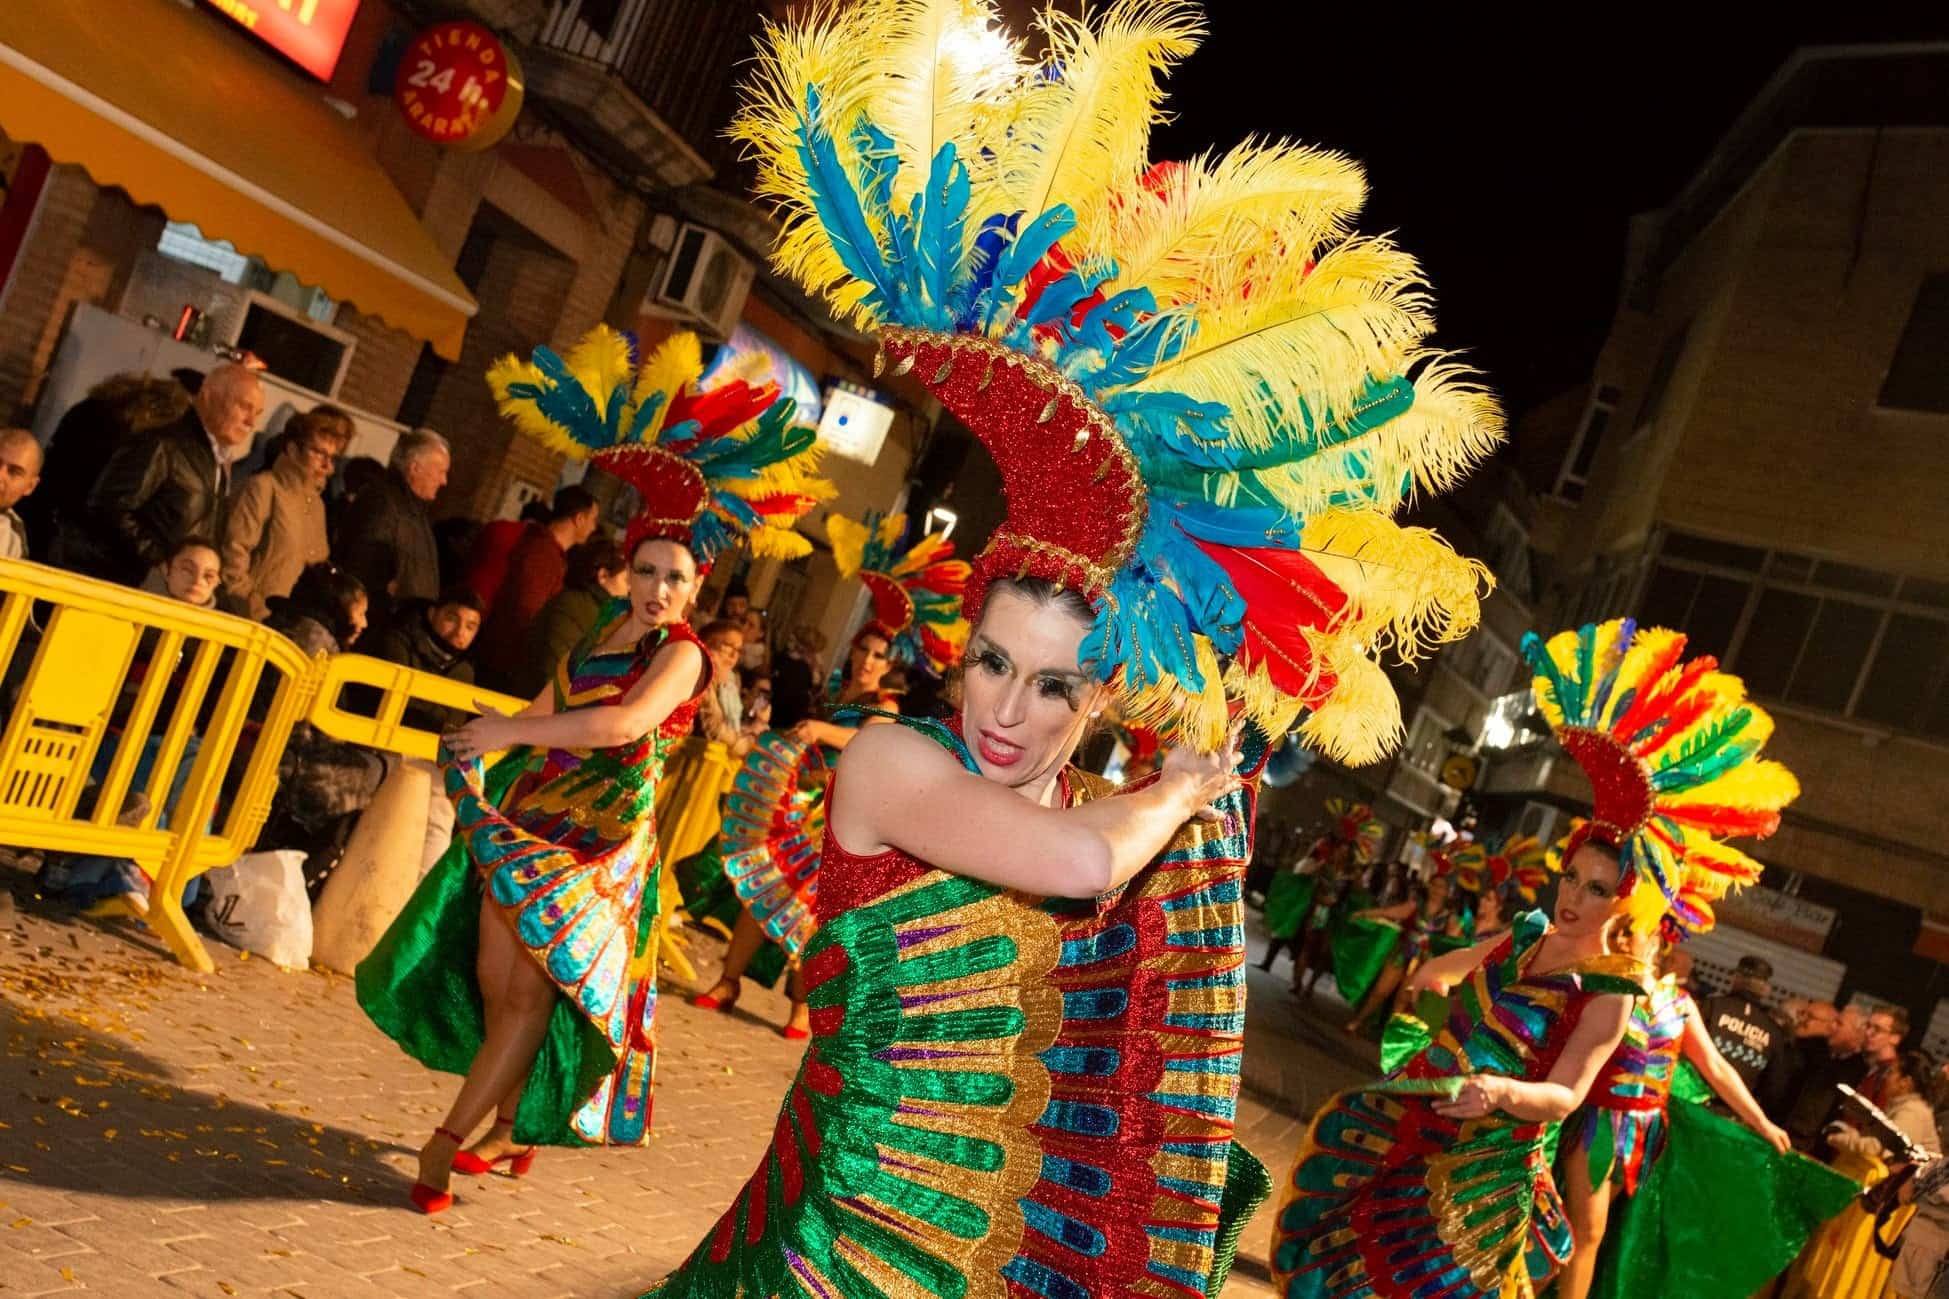 Carnaval de herencia 2020 ofertorio 84 - Selección de fotografías del Ofertorio del Carnaval de Herencia